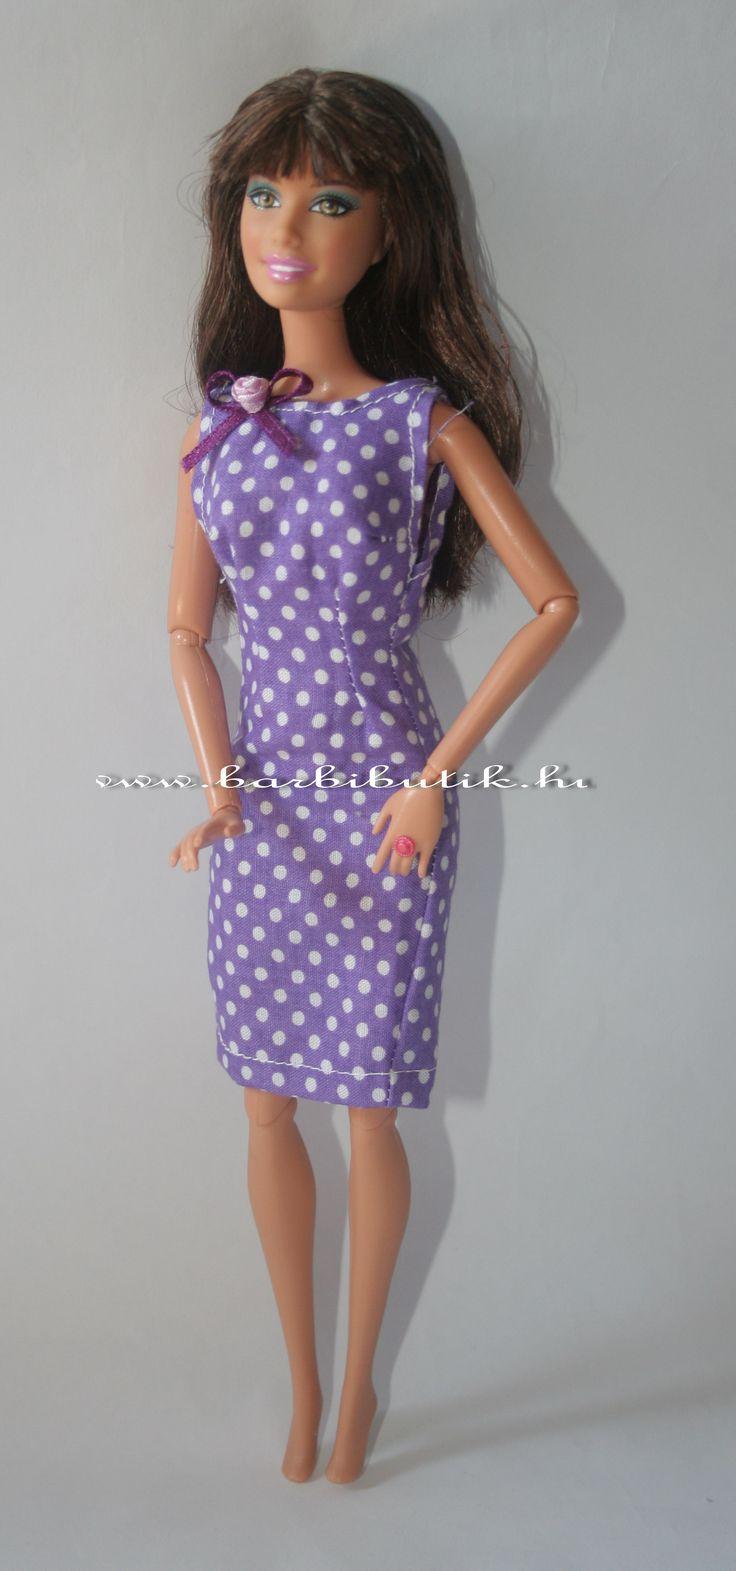 Lila fehér pöttyös szűkített Barbie ruha/ Lila white Barbie dress